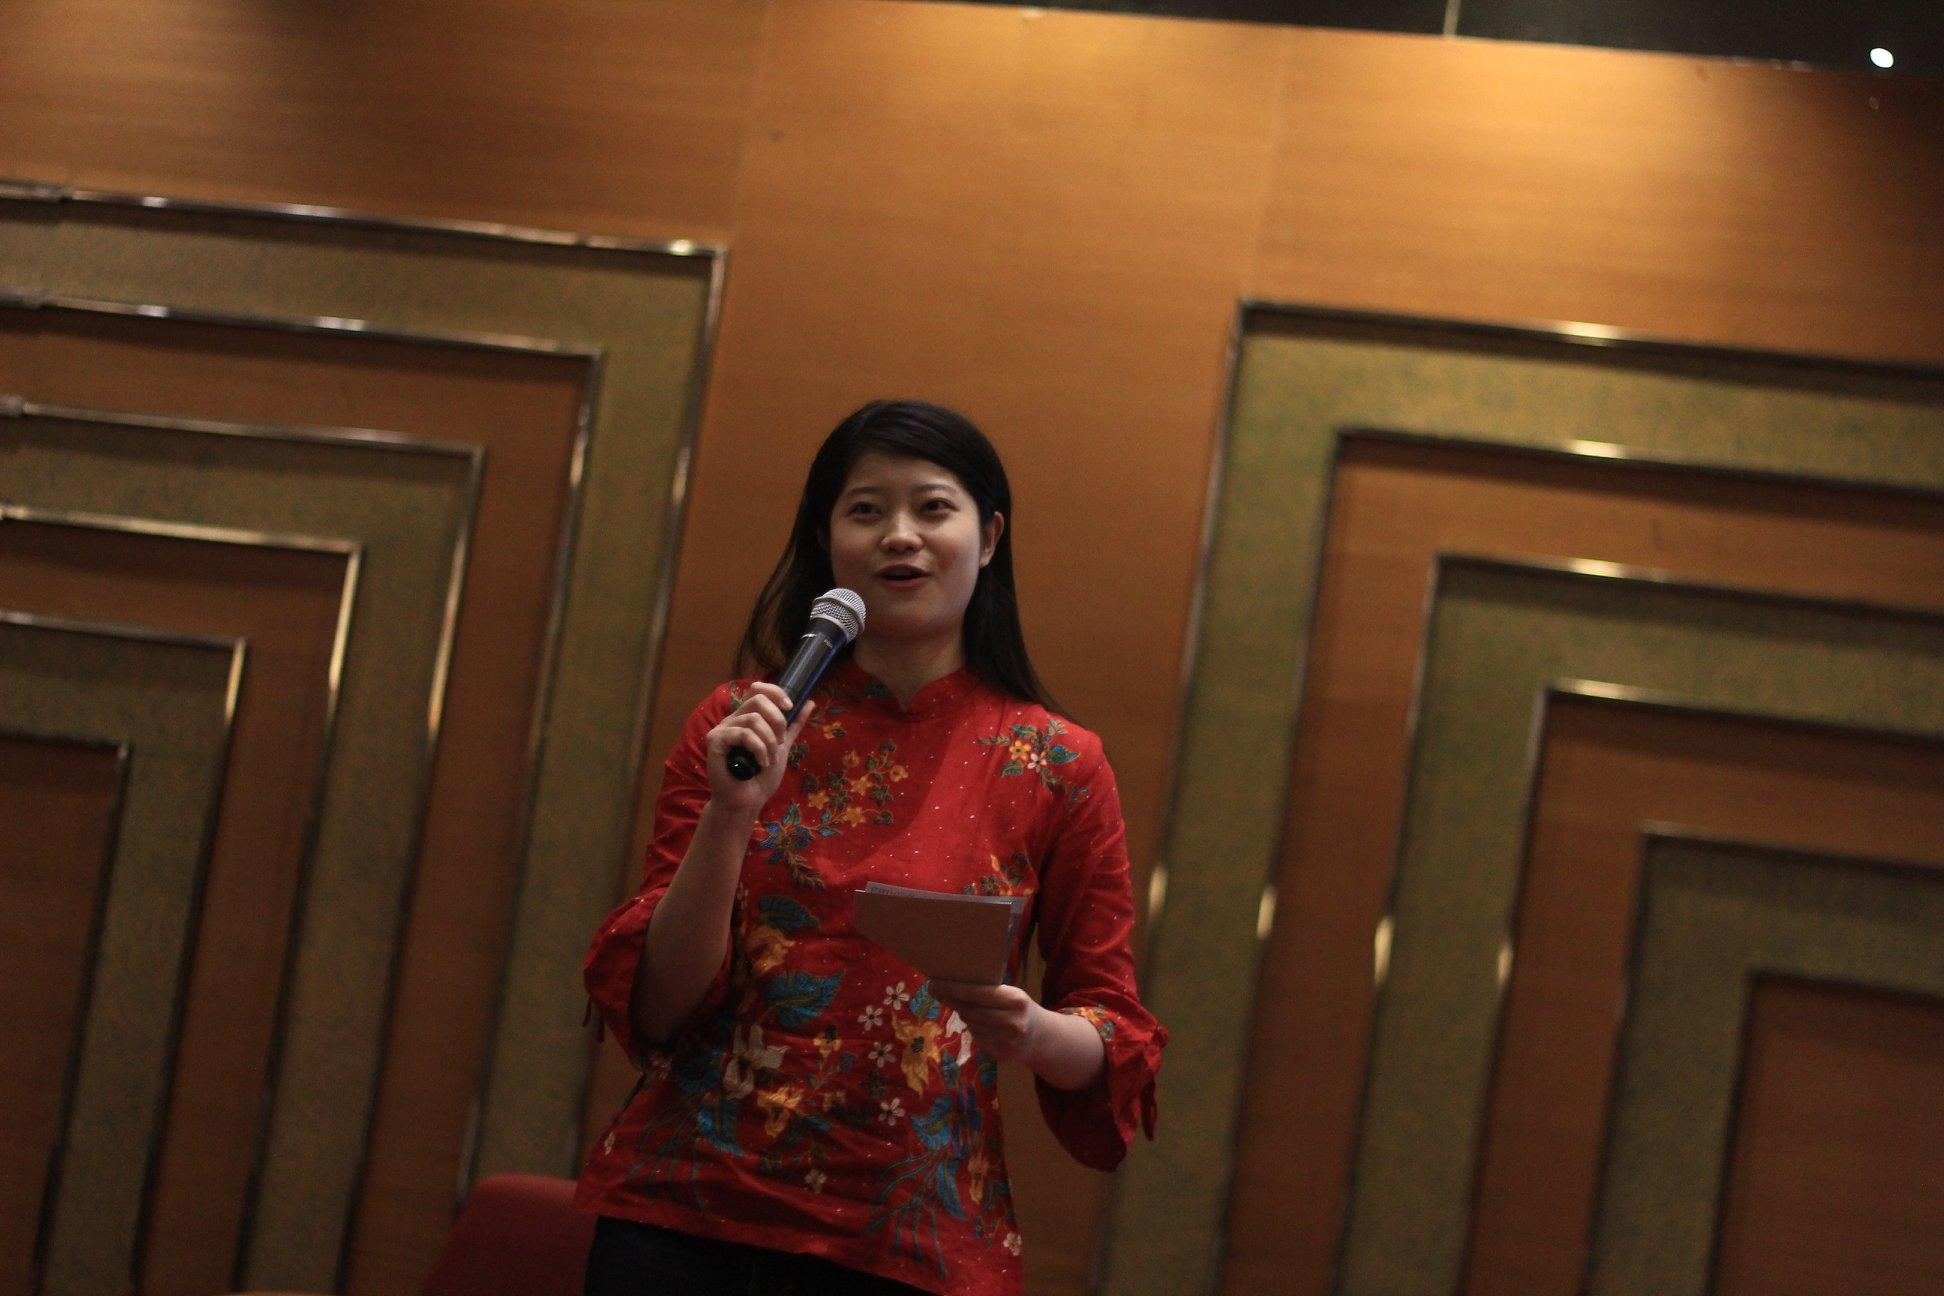 Dokumentasi Seminar AMA Bandung di Bulan Juni 2019